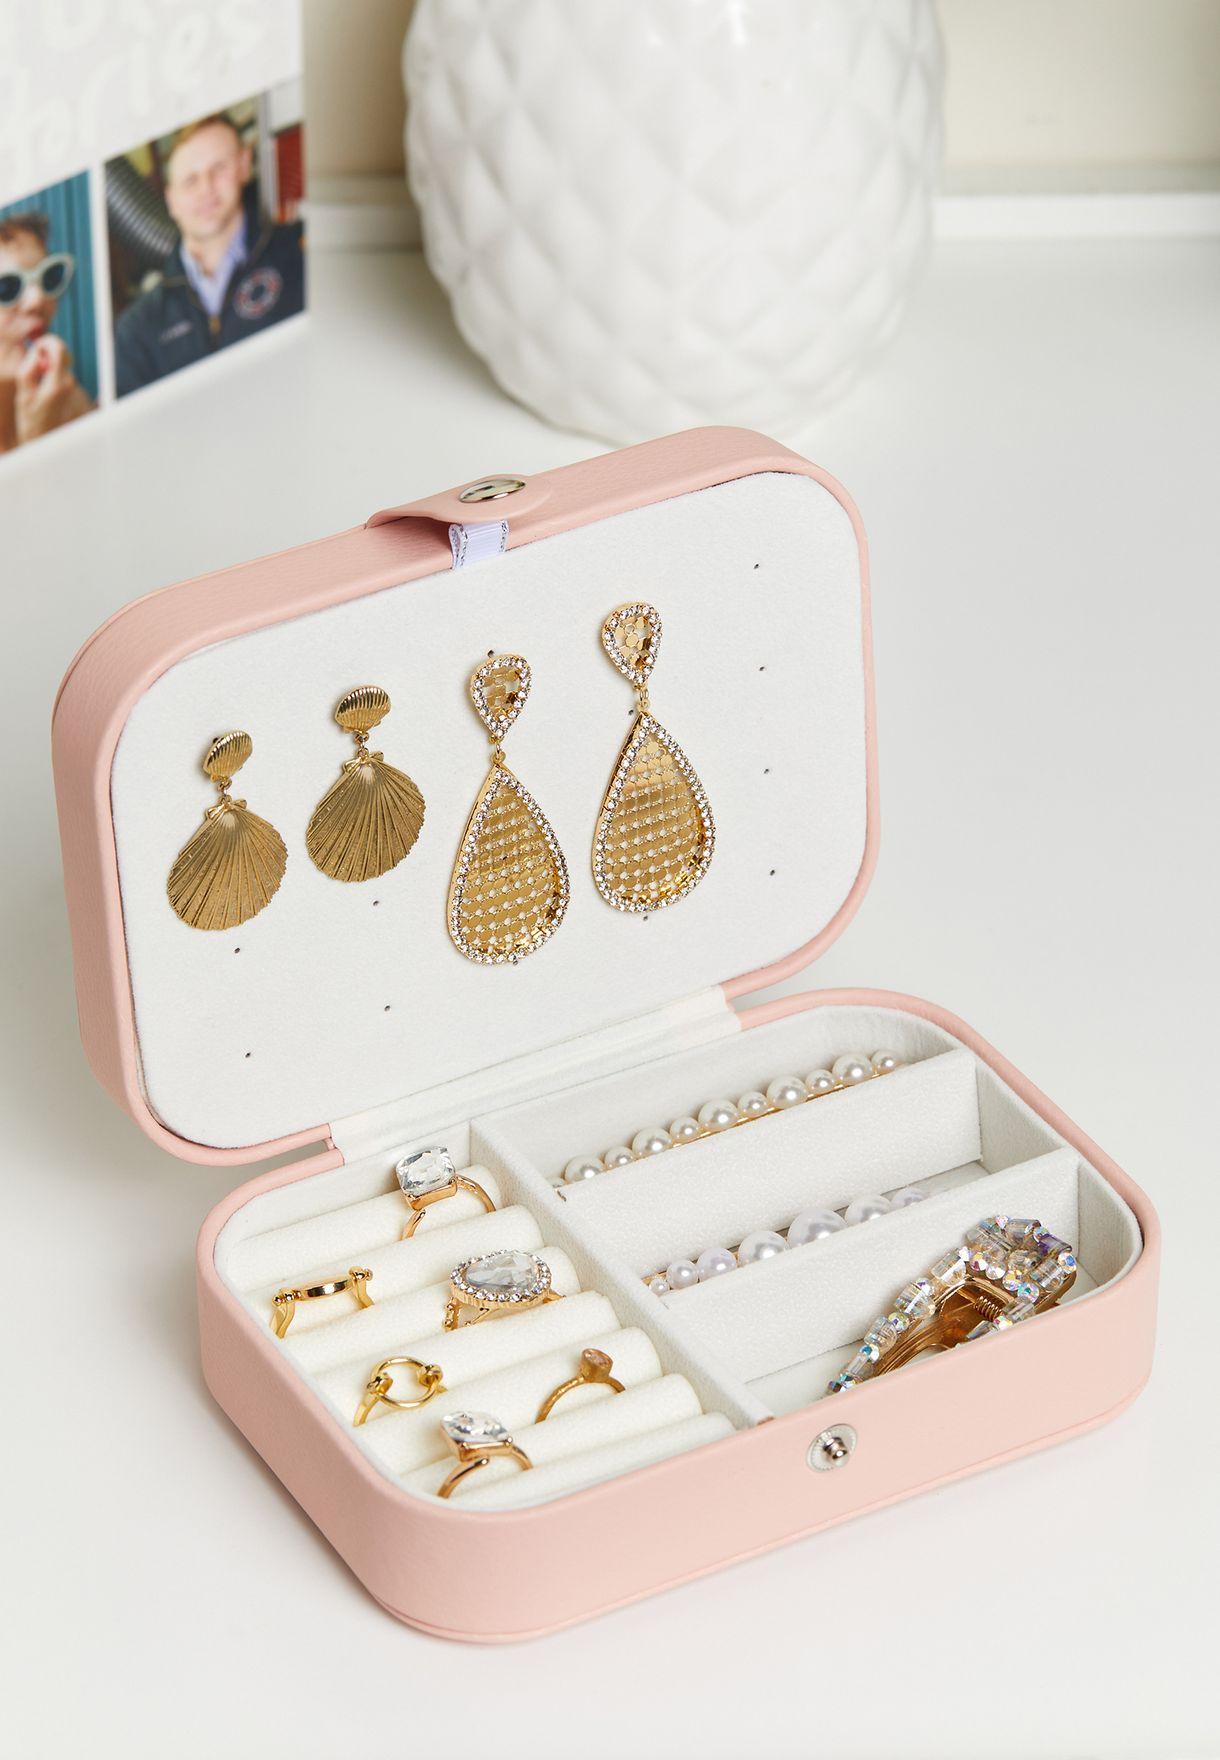 صندوق تخزين مجوهرات بسحاب